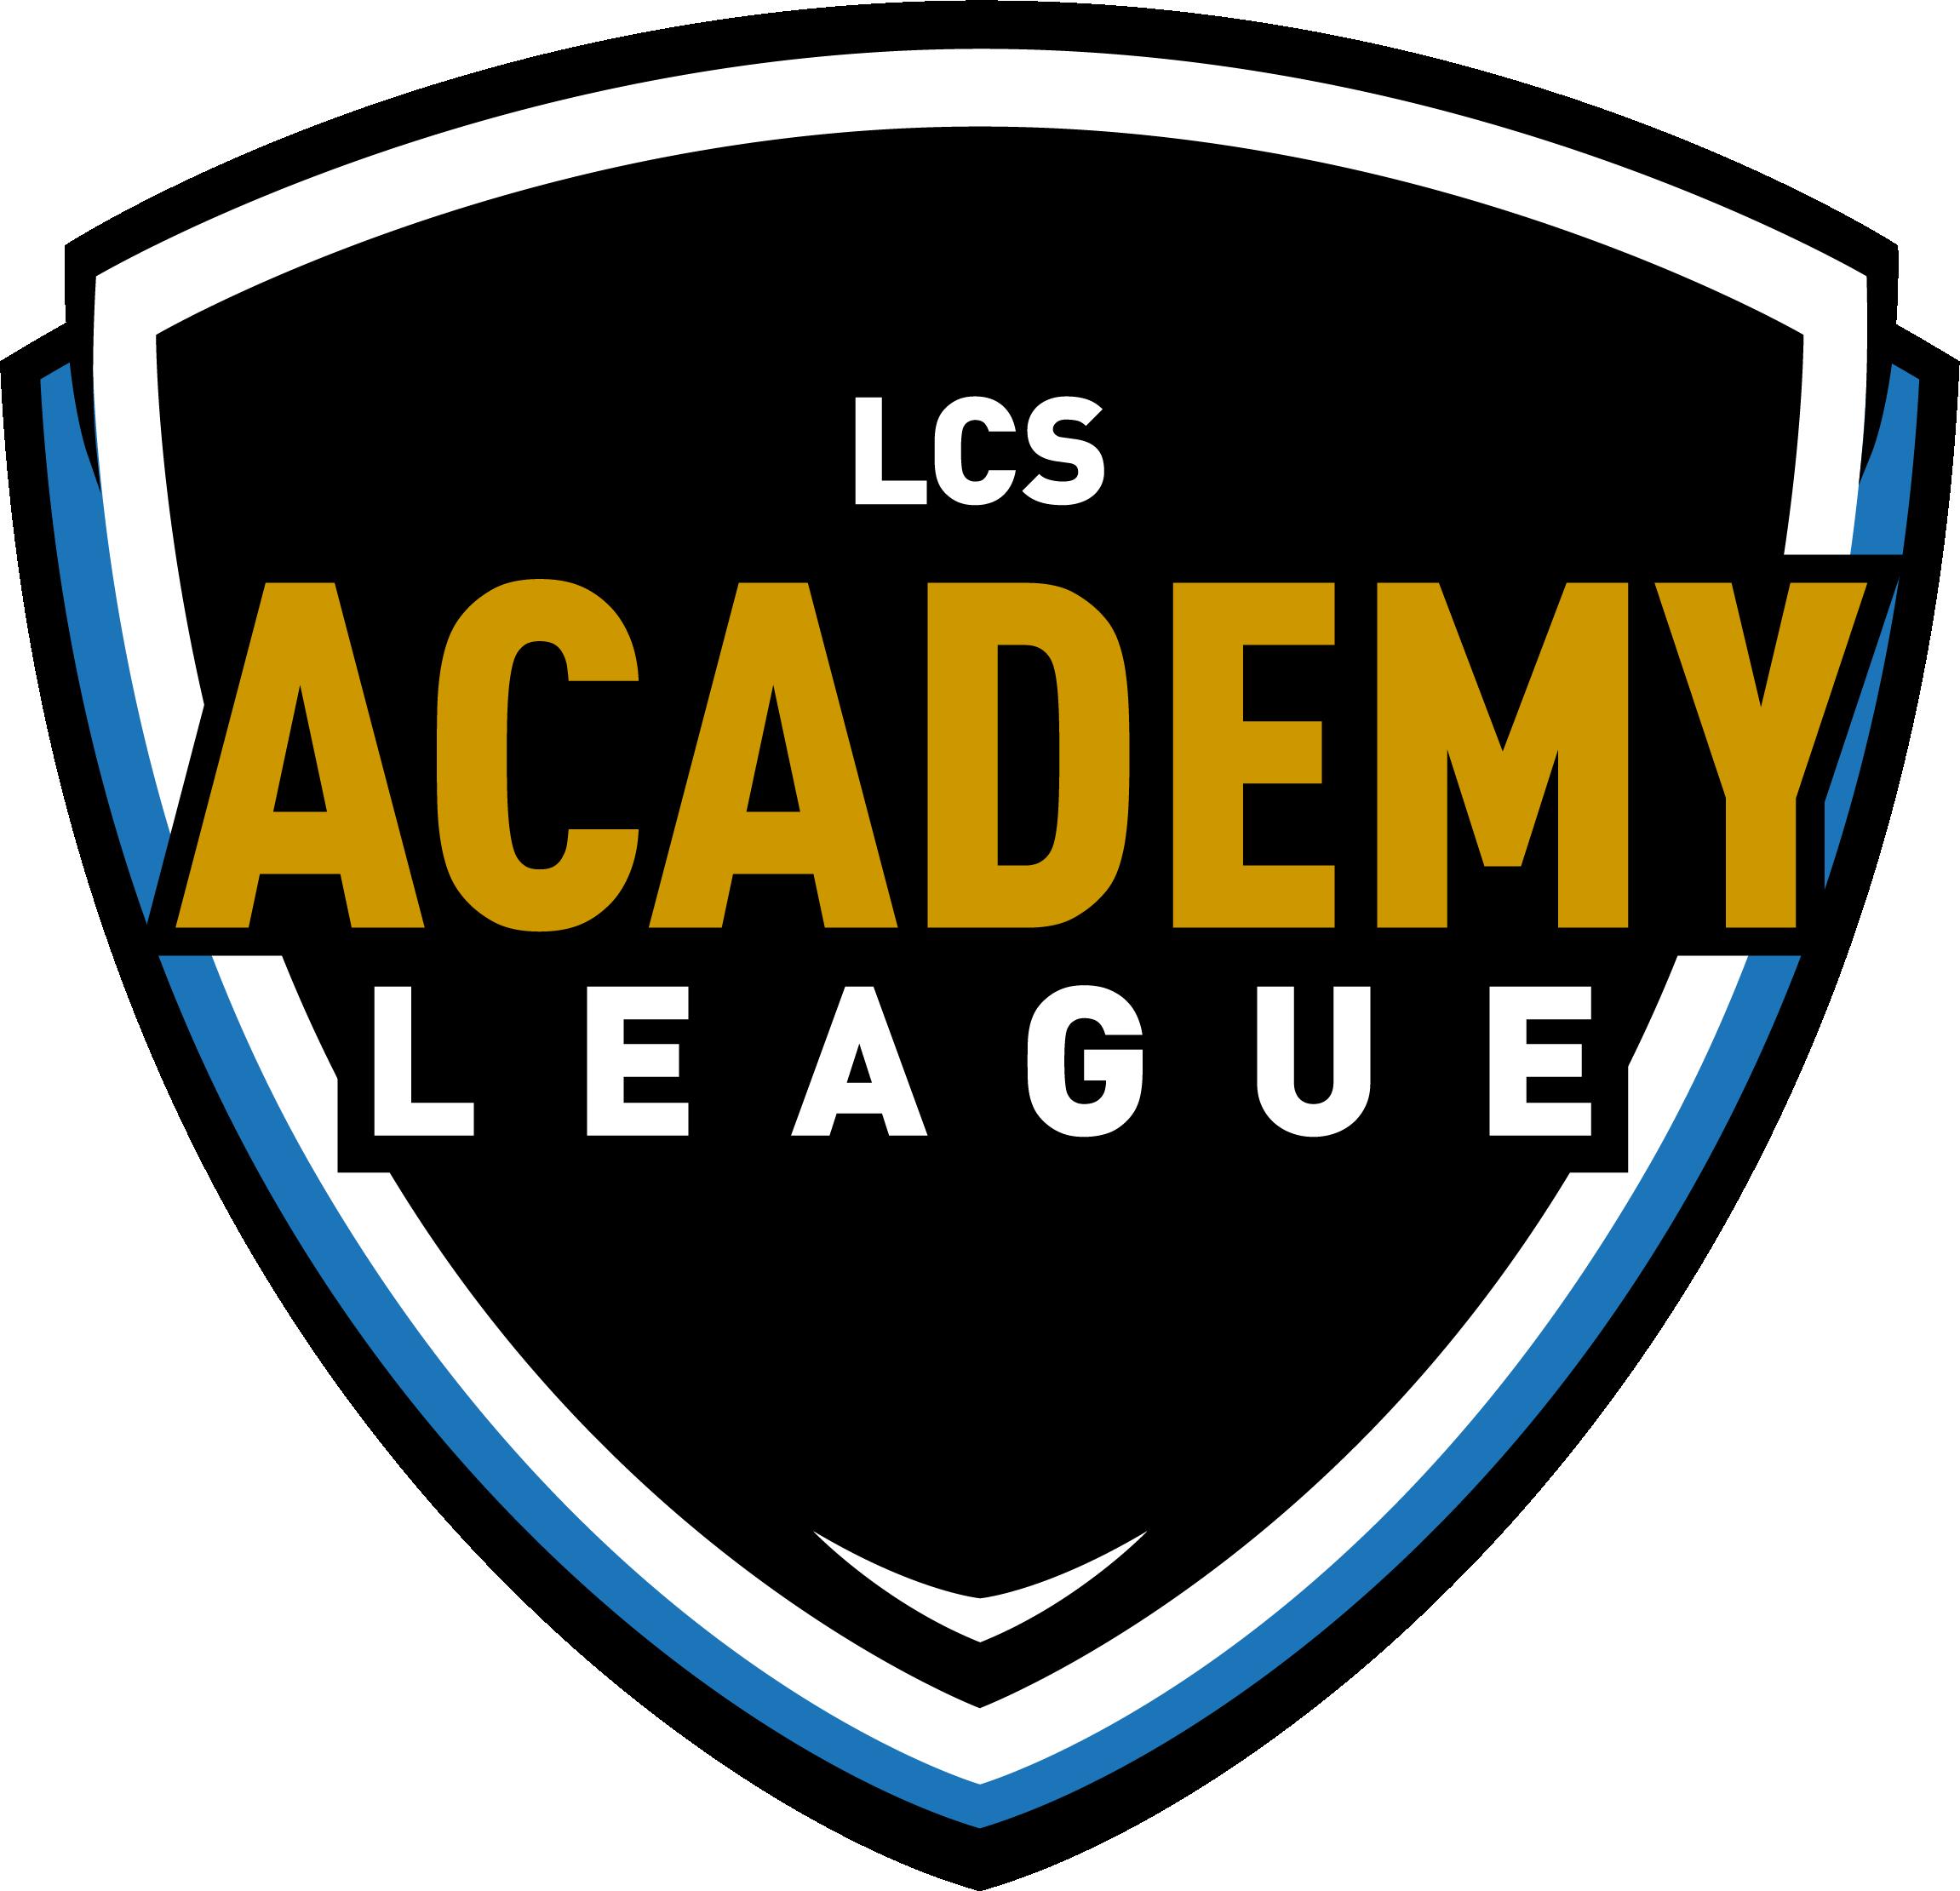 LCS_AcademyLeague_Color_Logo_LightBg.png